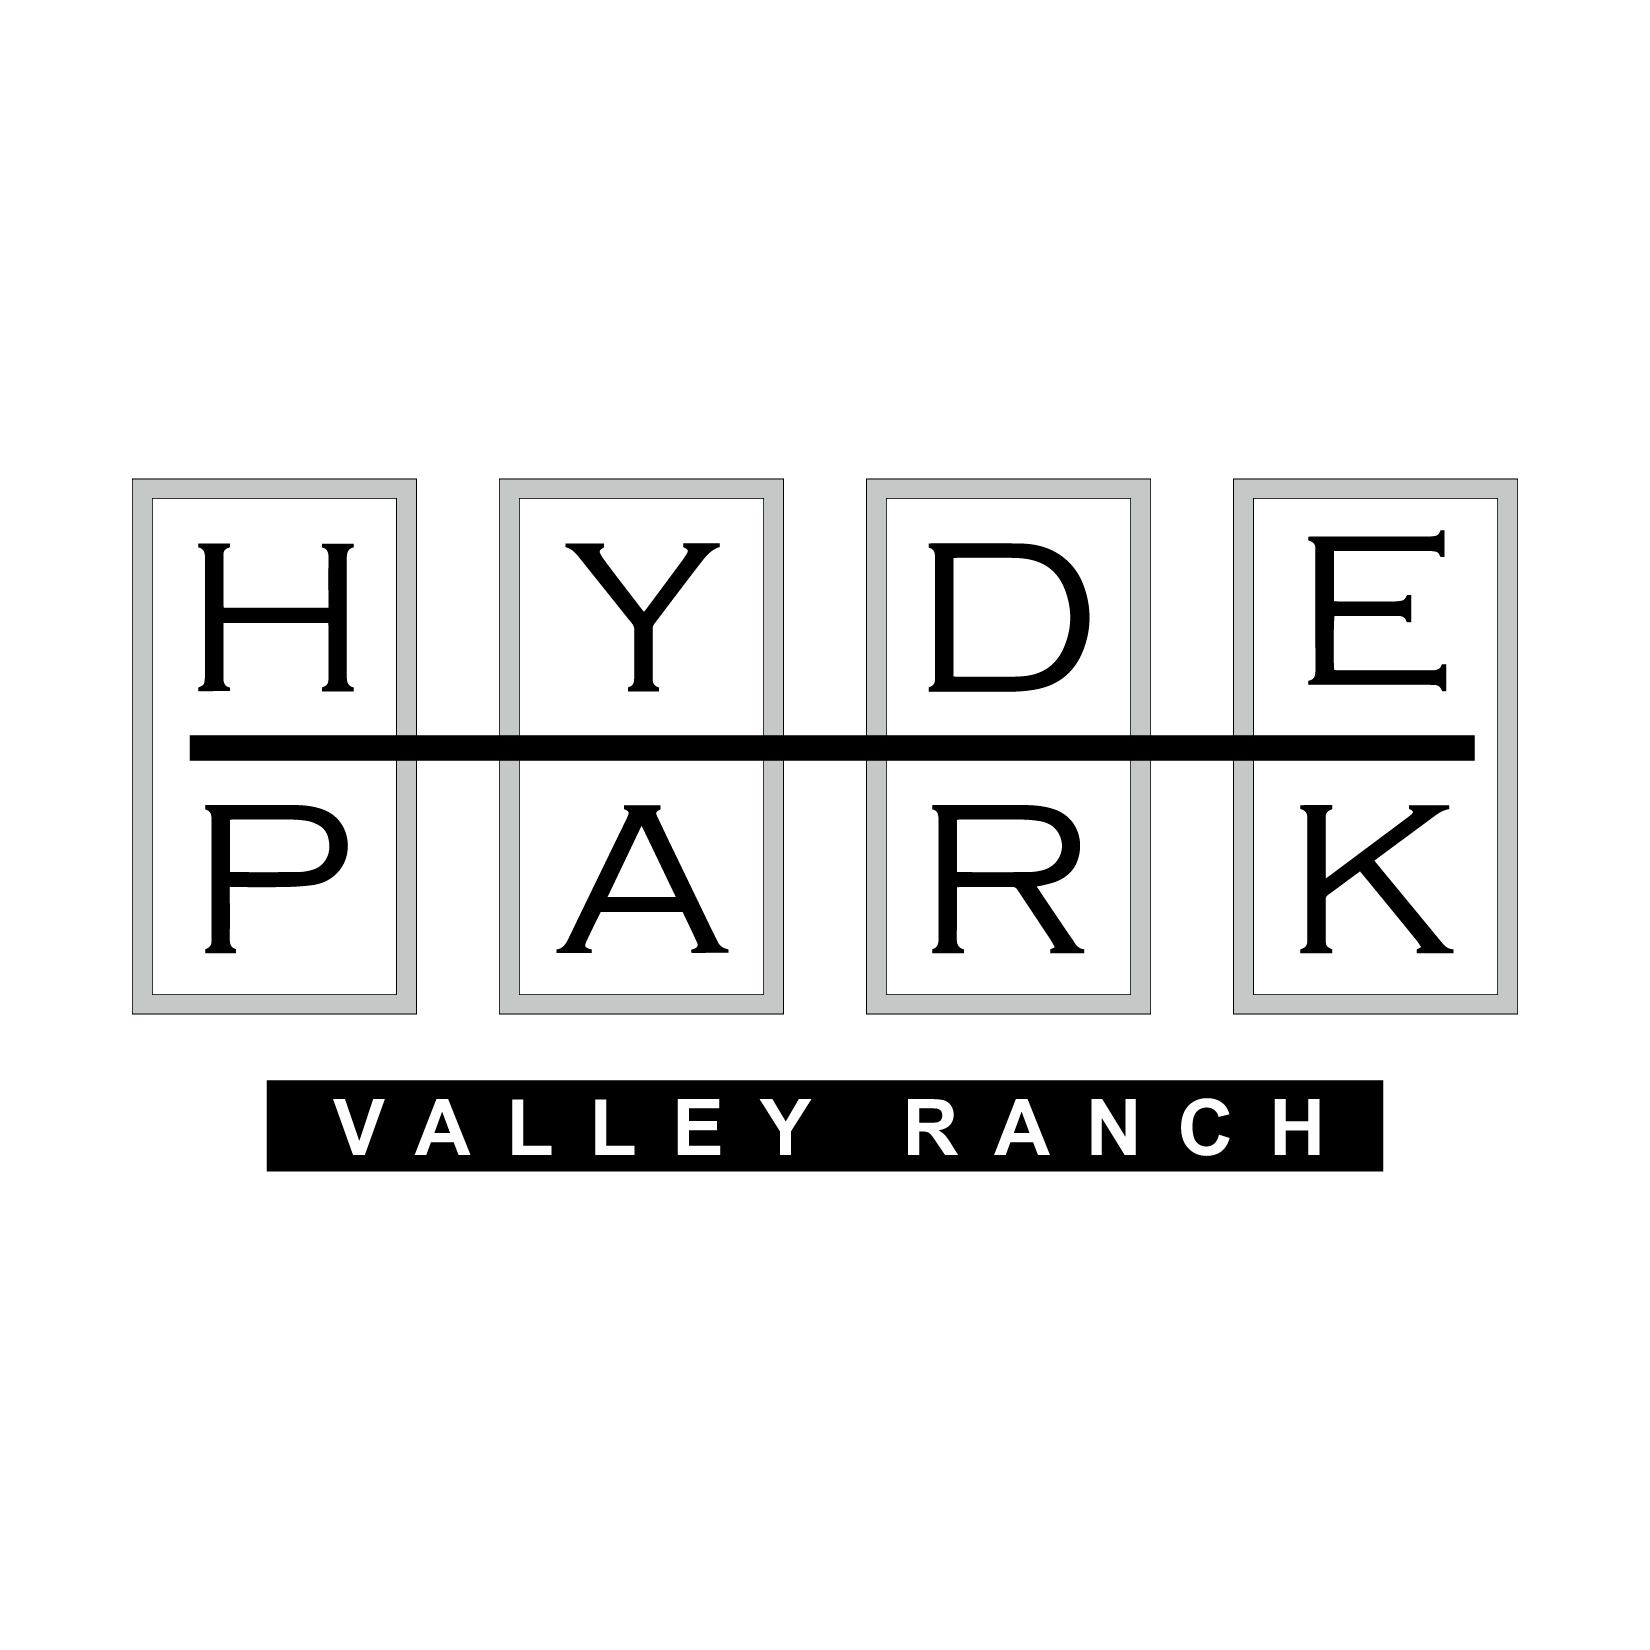 Hyde Park at Valley Ranch